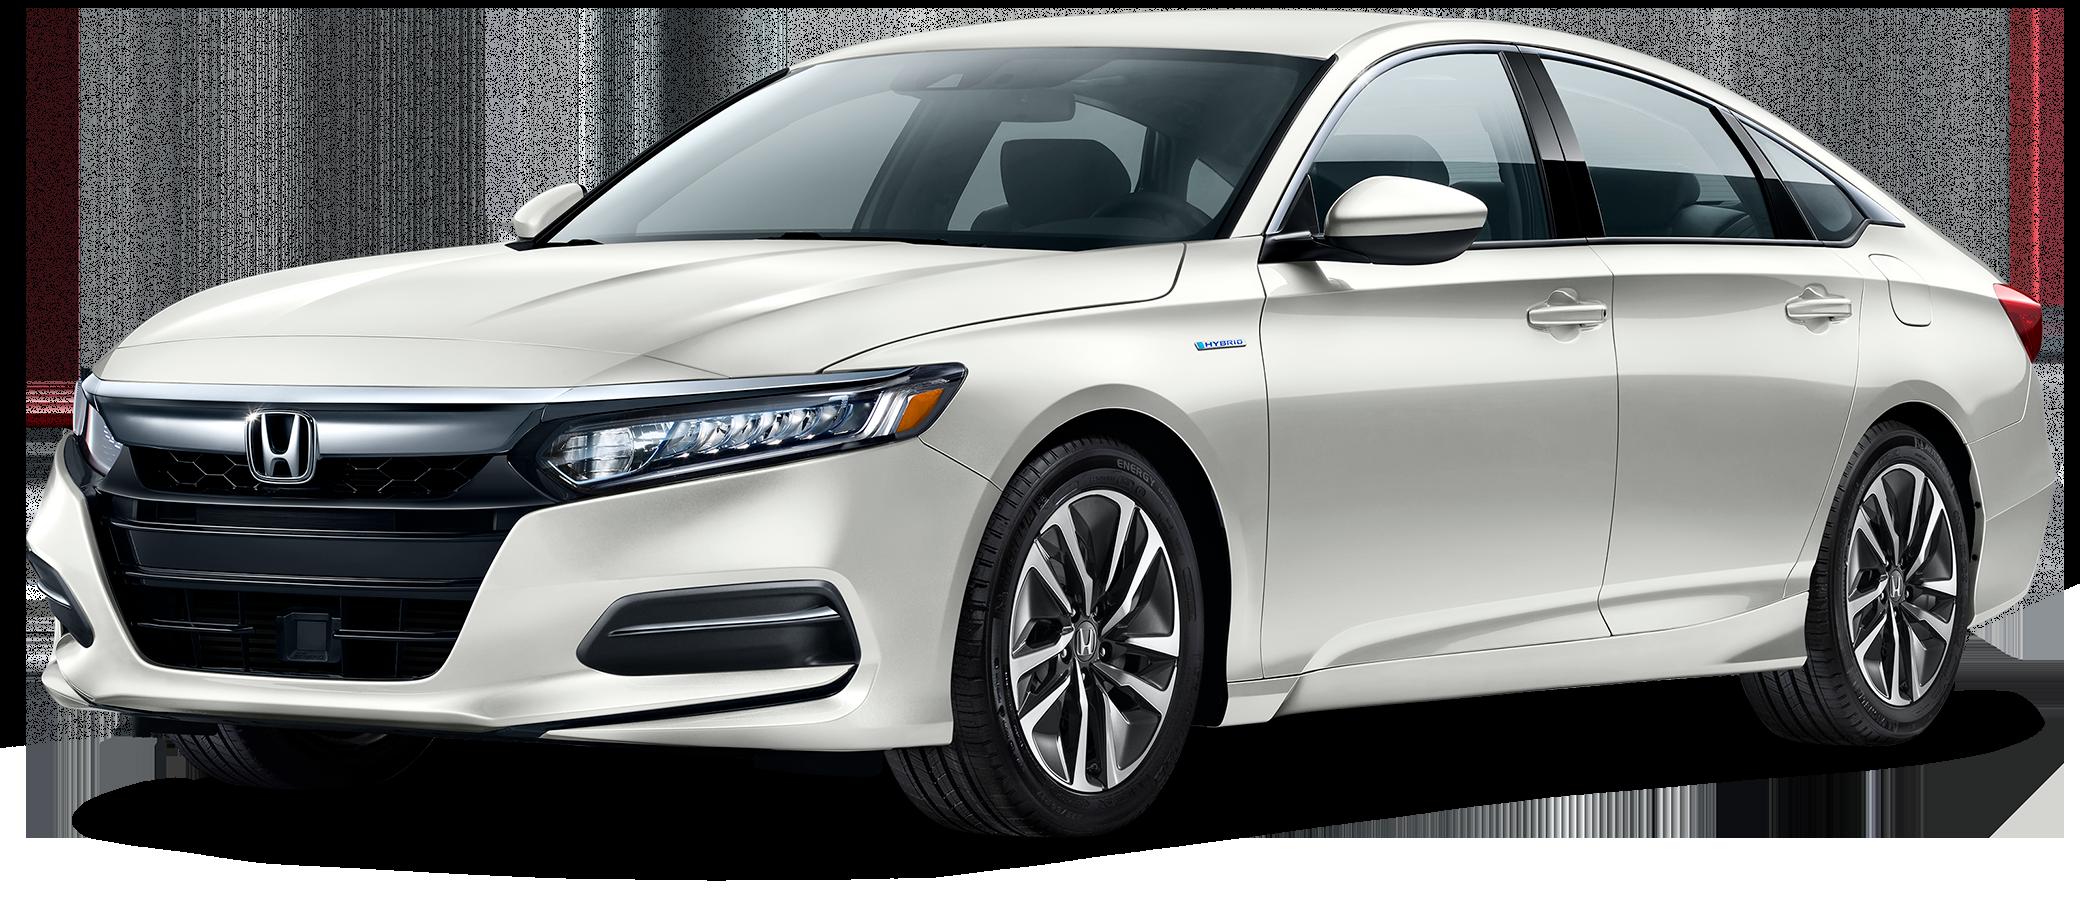 2020 Honda Accord Hybrid Pricing